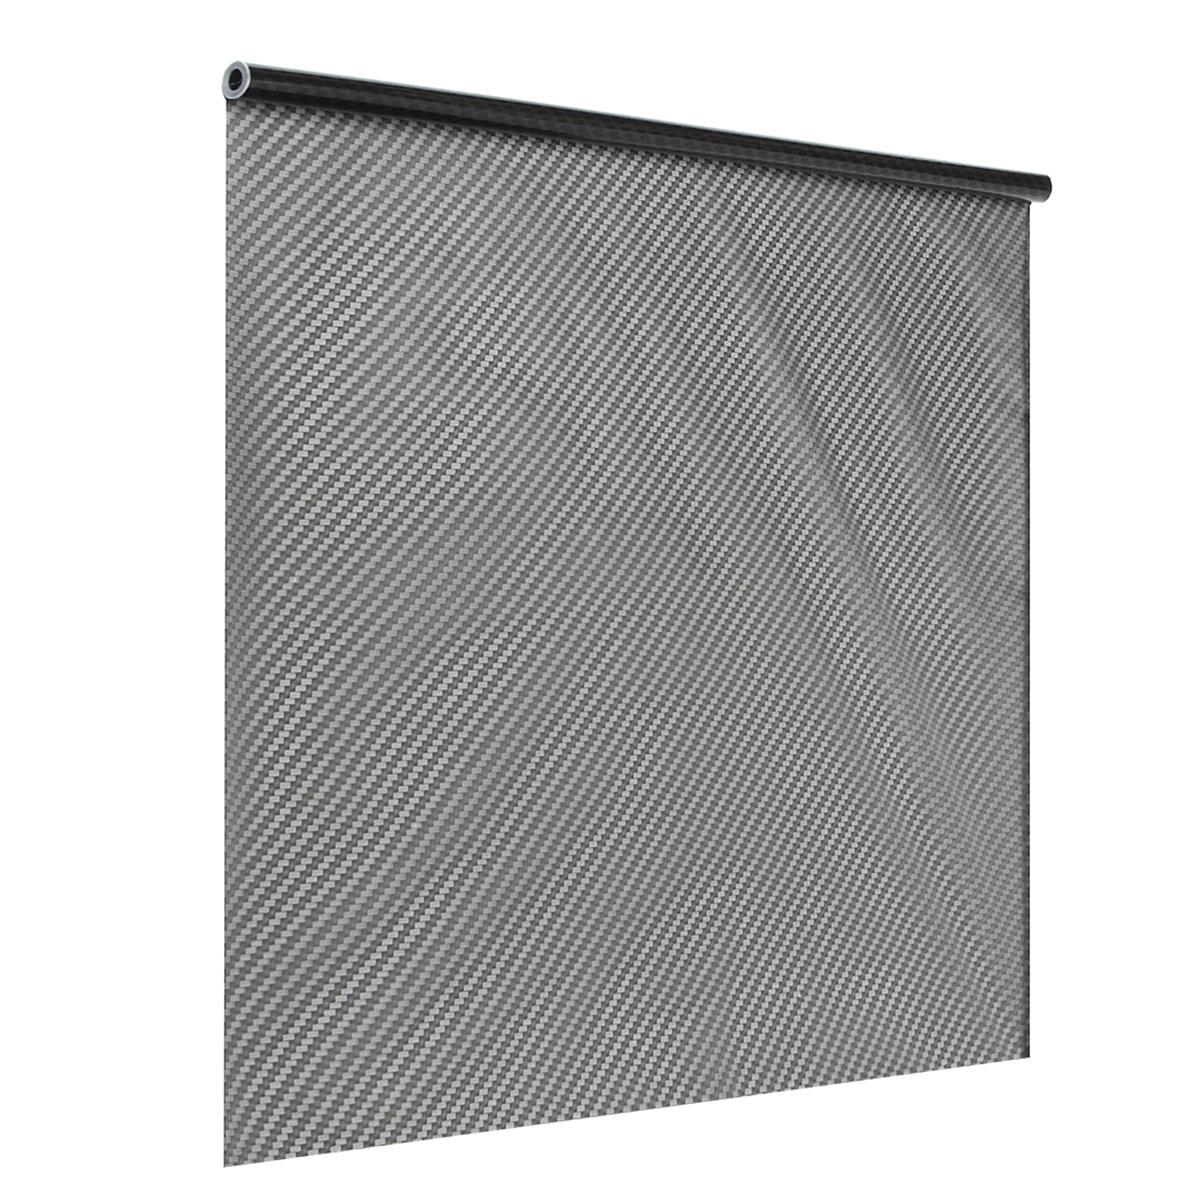 PVA Black Carbon Fiber PVC Hydrographics Water Transfer Printing Film 50x300 cm